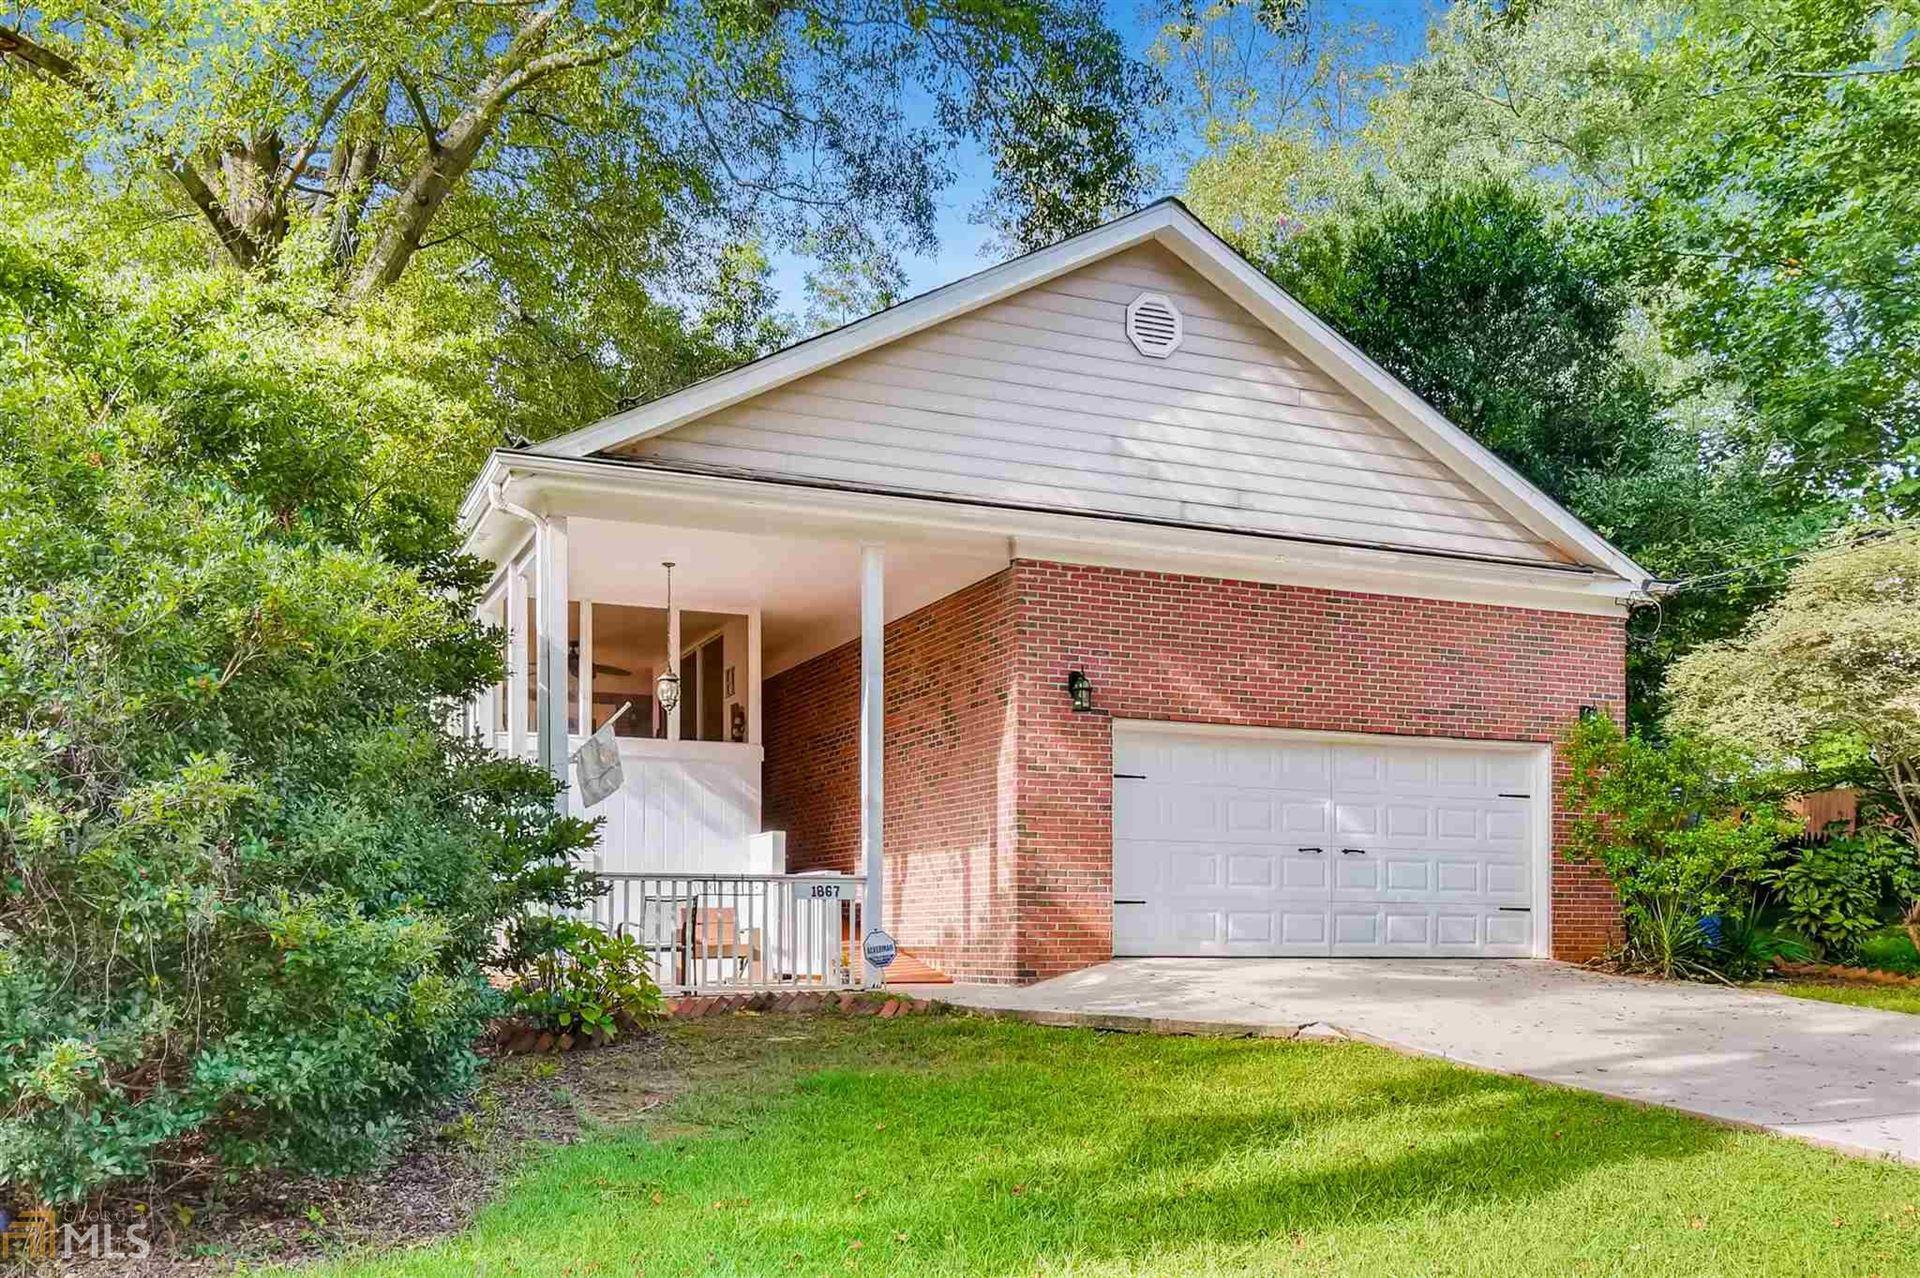 1867 Thompson Ave, Atlanta, GA 30344 - #: 8851603